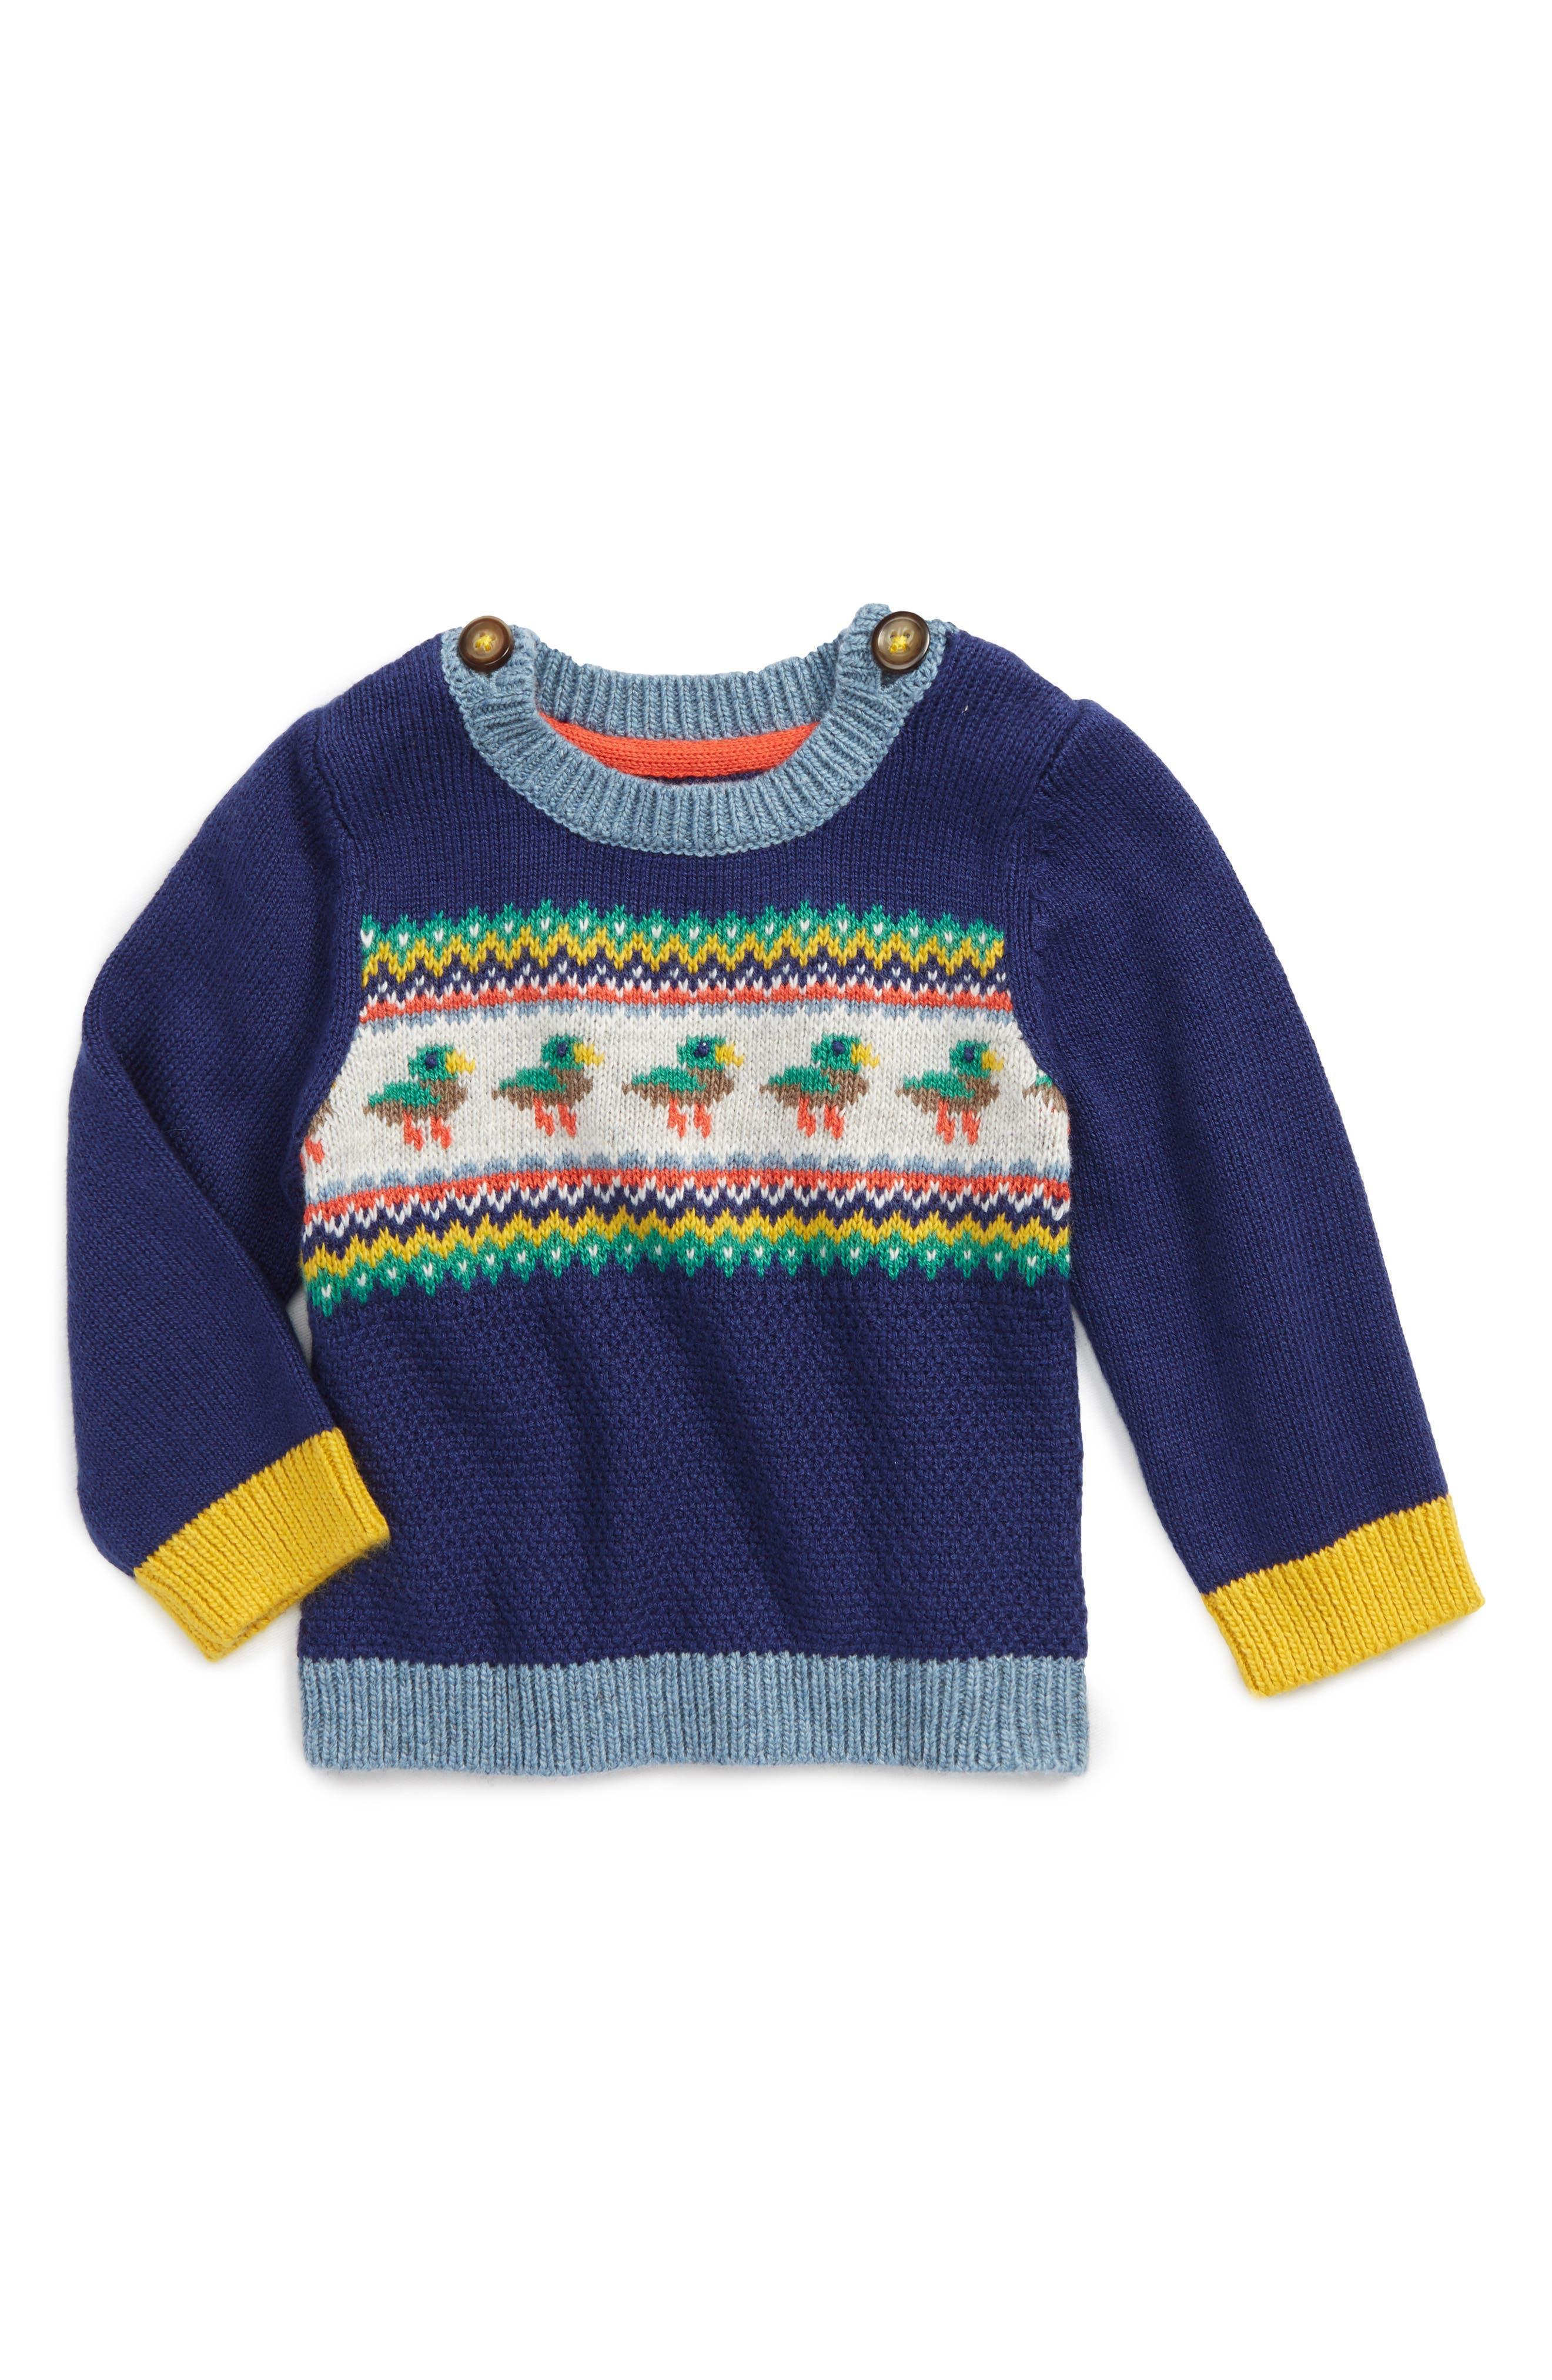 Fun Knit Sweater,                             Main thumbnail 1, color,                             Beacon Blue Ducks